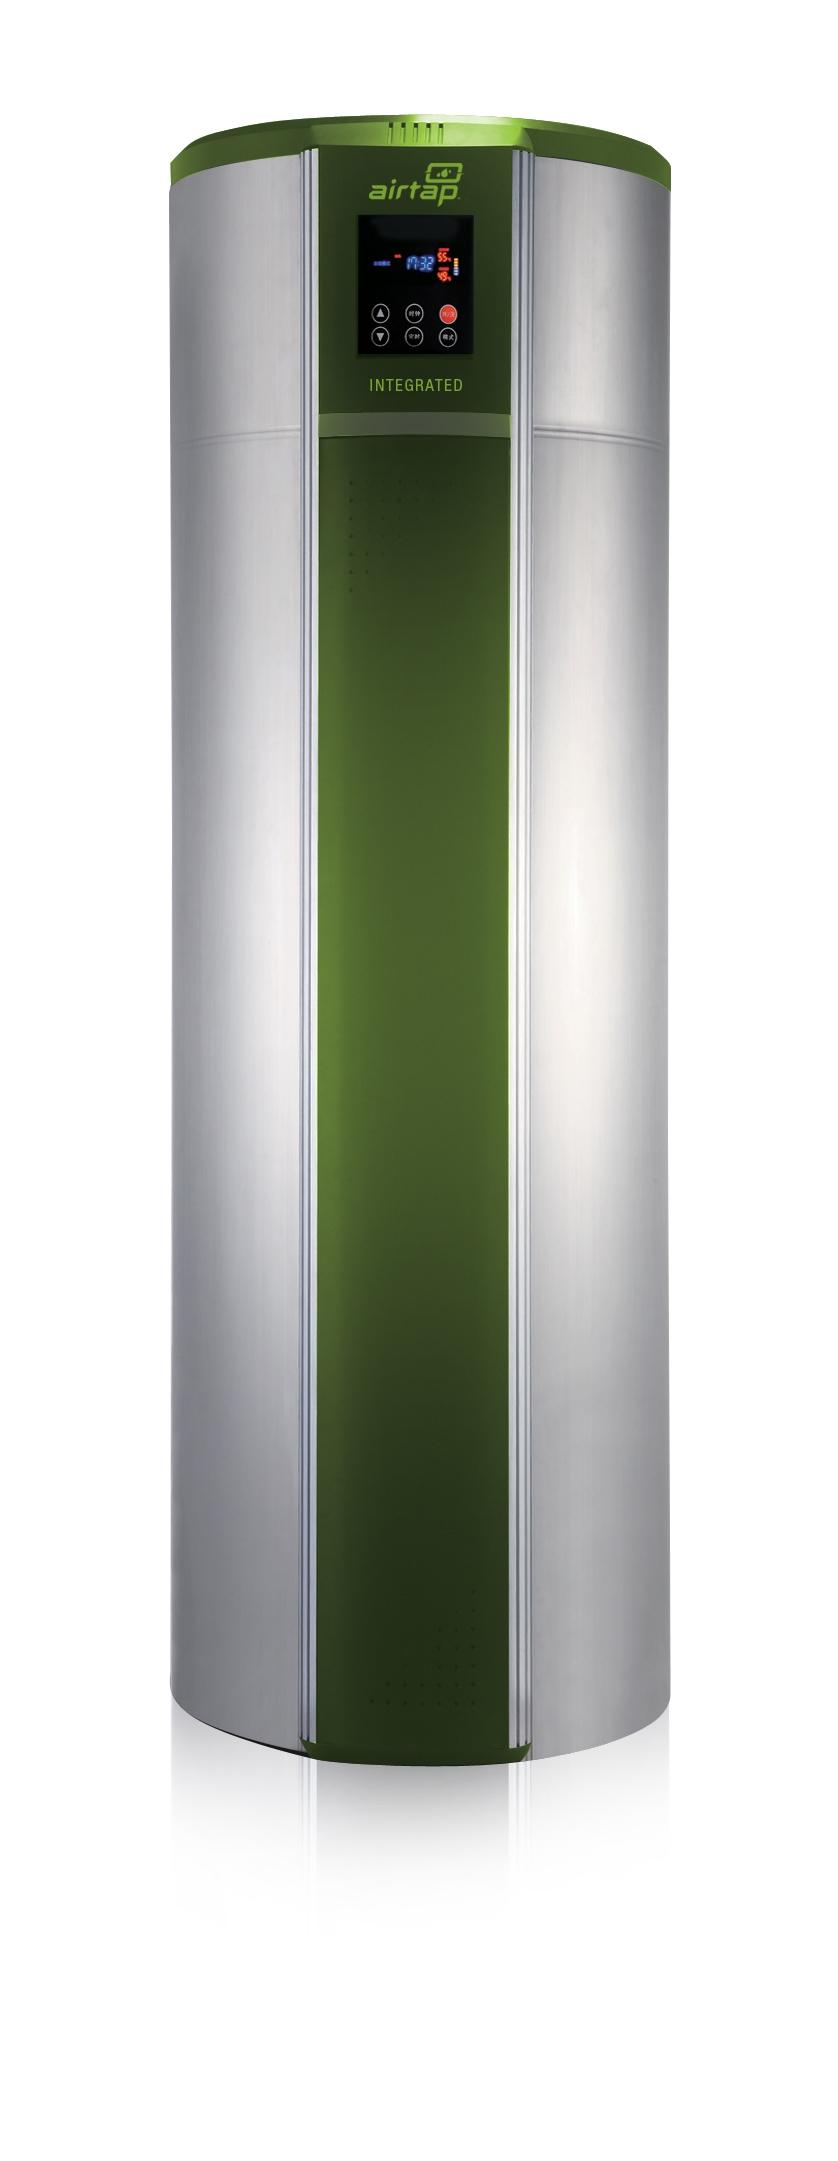 Airtap Hybrid Water Heaterairtap Heater